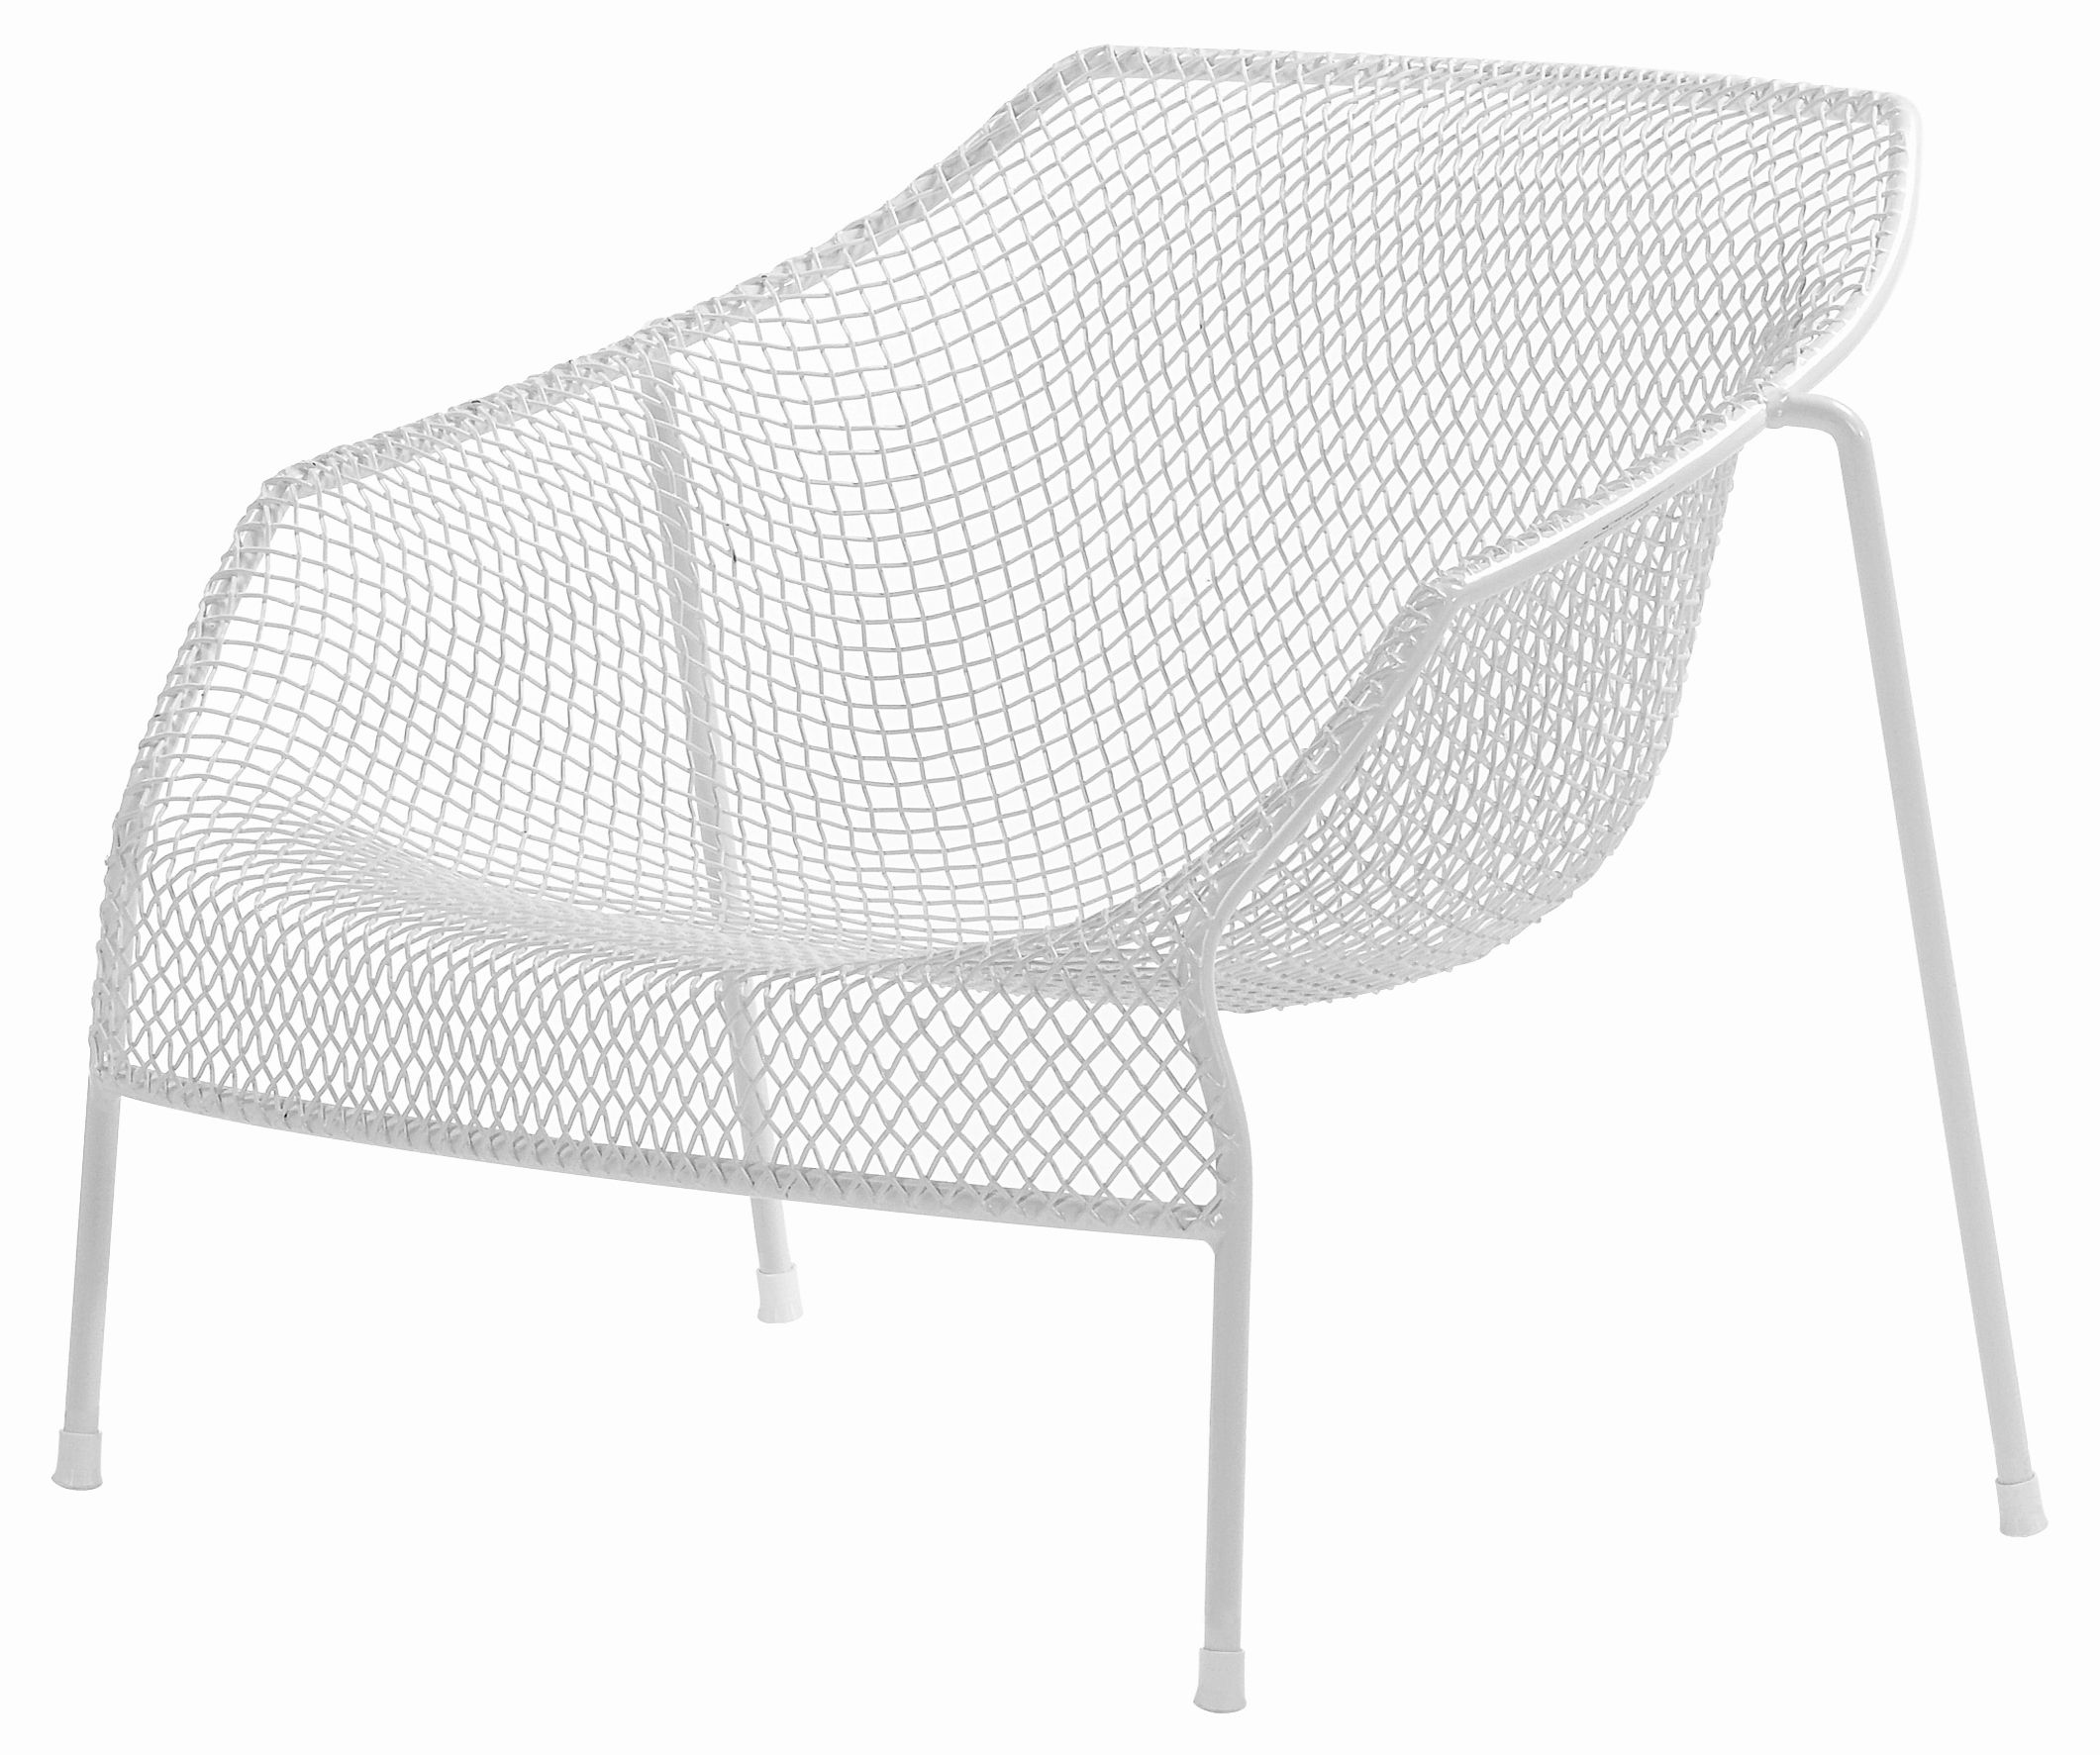 Möbel - Lounge Sessel - Heaven Lounge Sessel - Emu - Weiß - Stahl